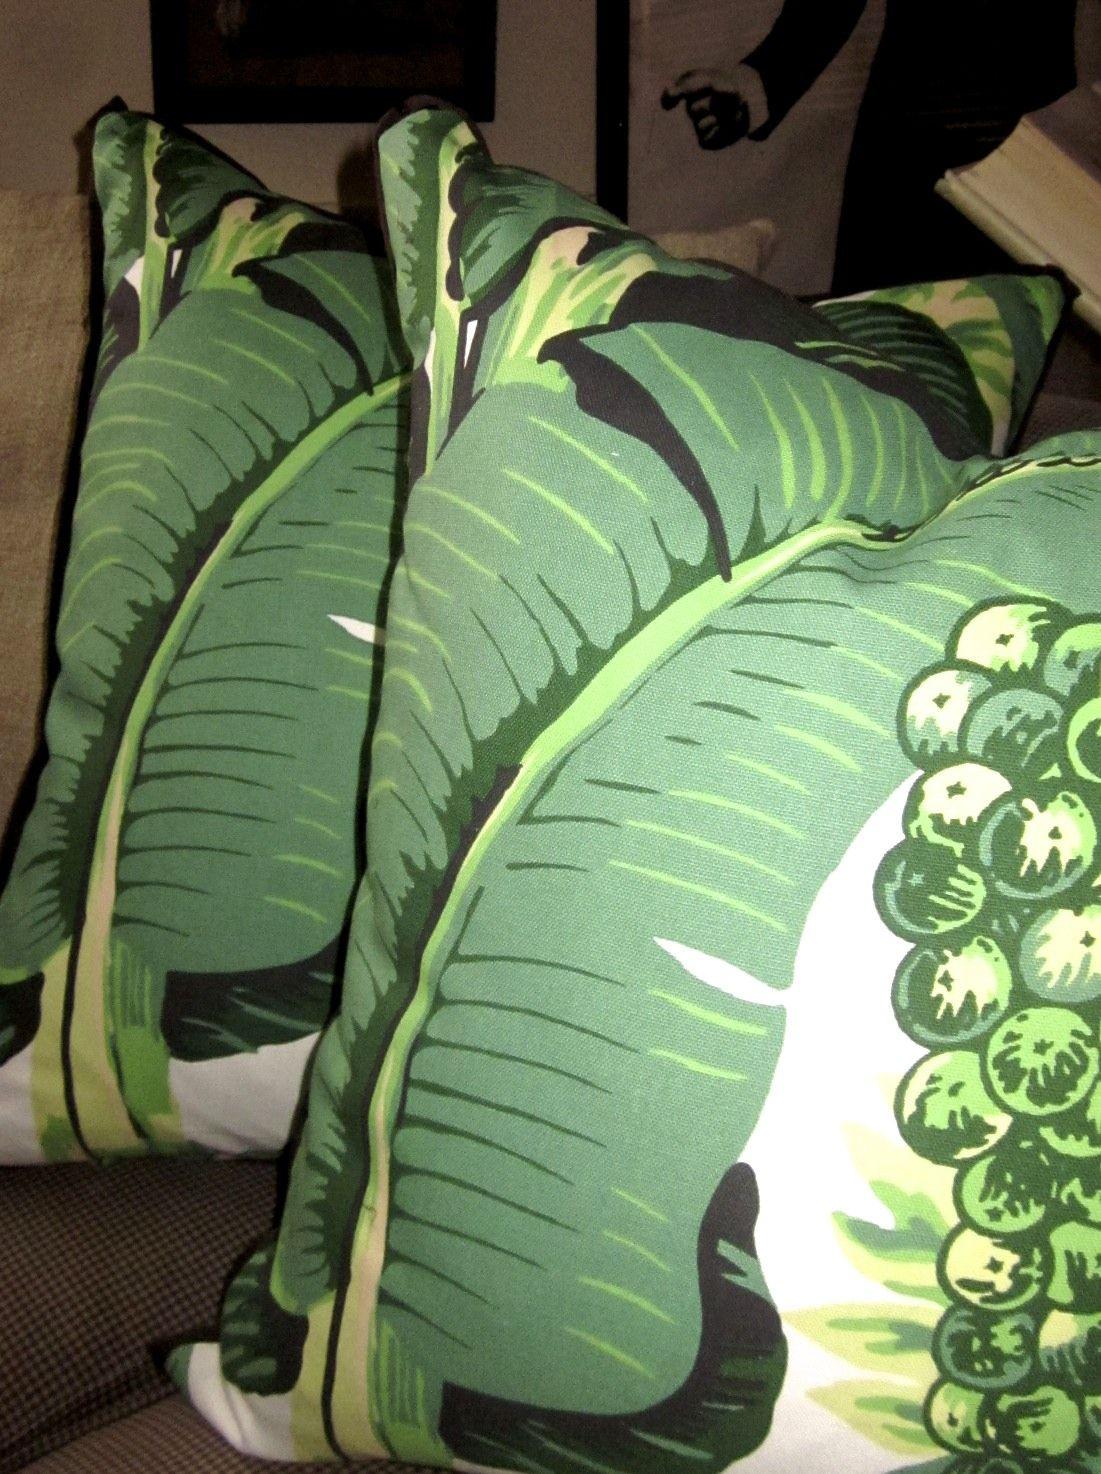 Carleton Varney for Dorothy Draper Palm Fabric with Black